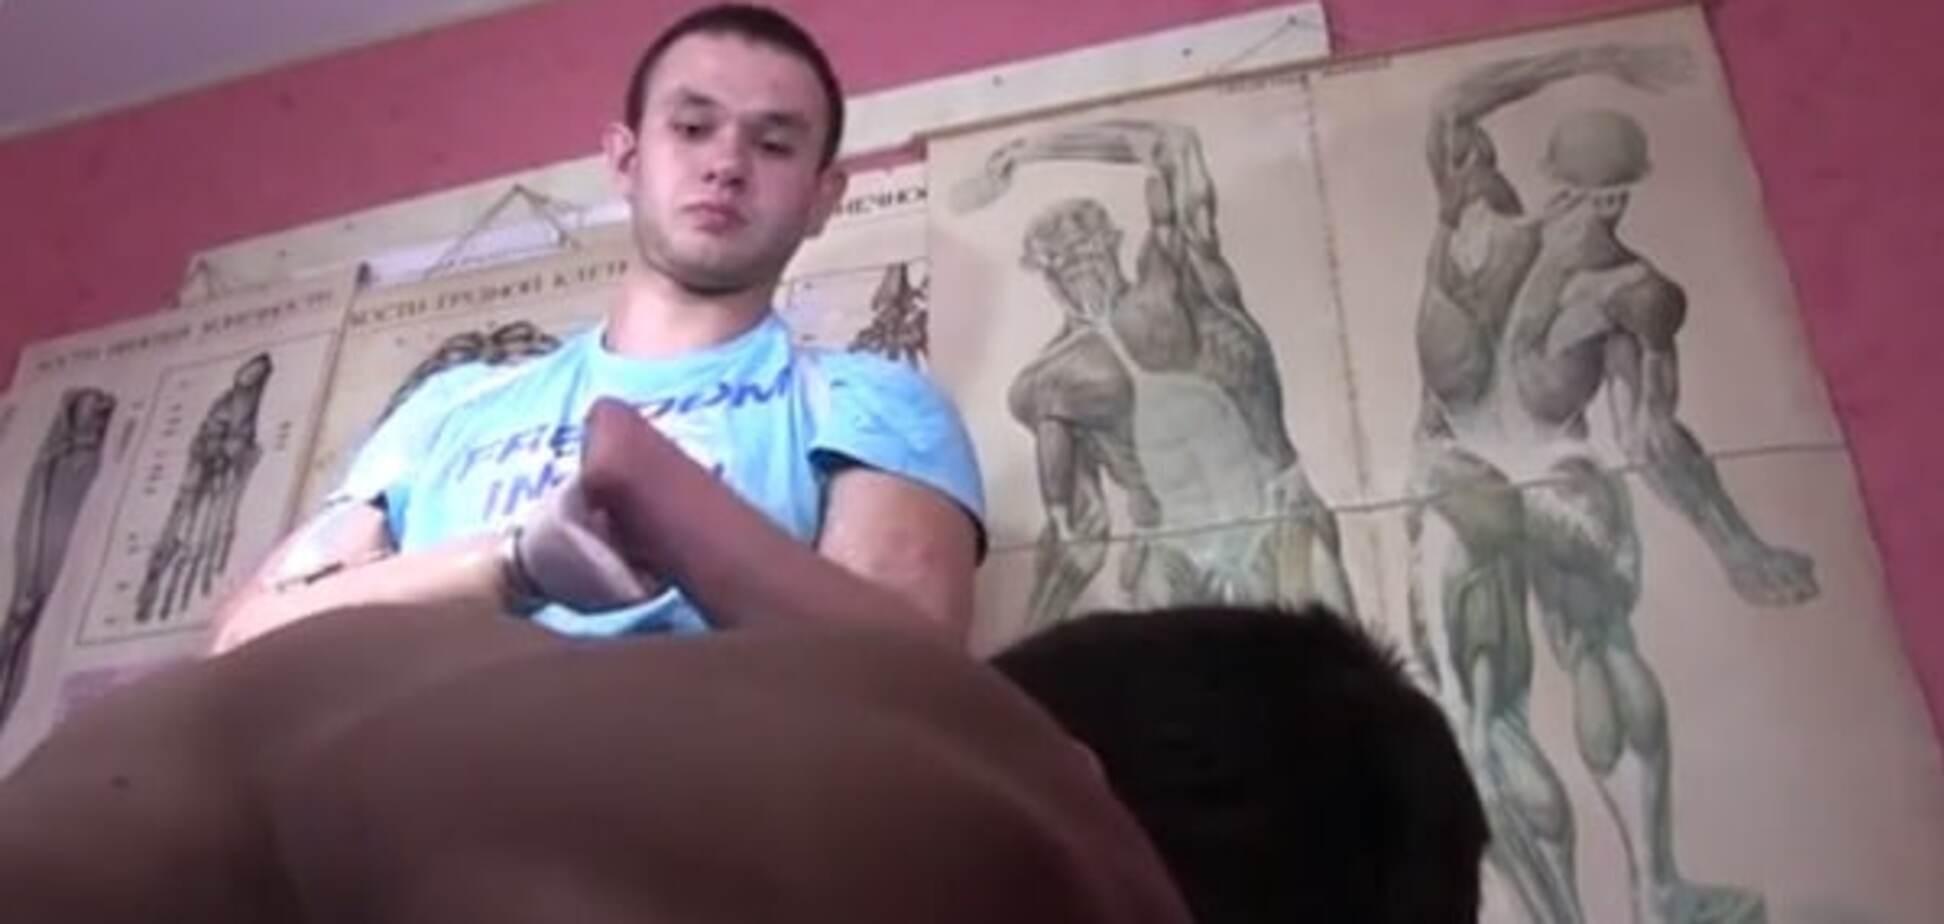 Ветеран АТО, потерявший обе кисти, стал массажистом: видеофакт